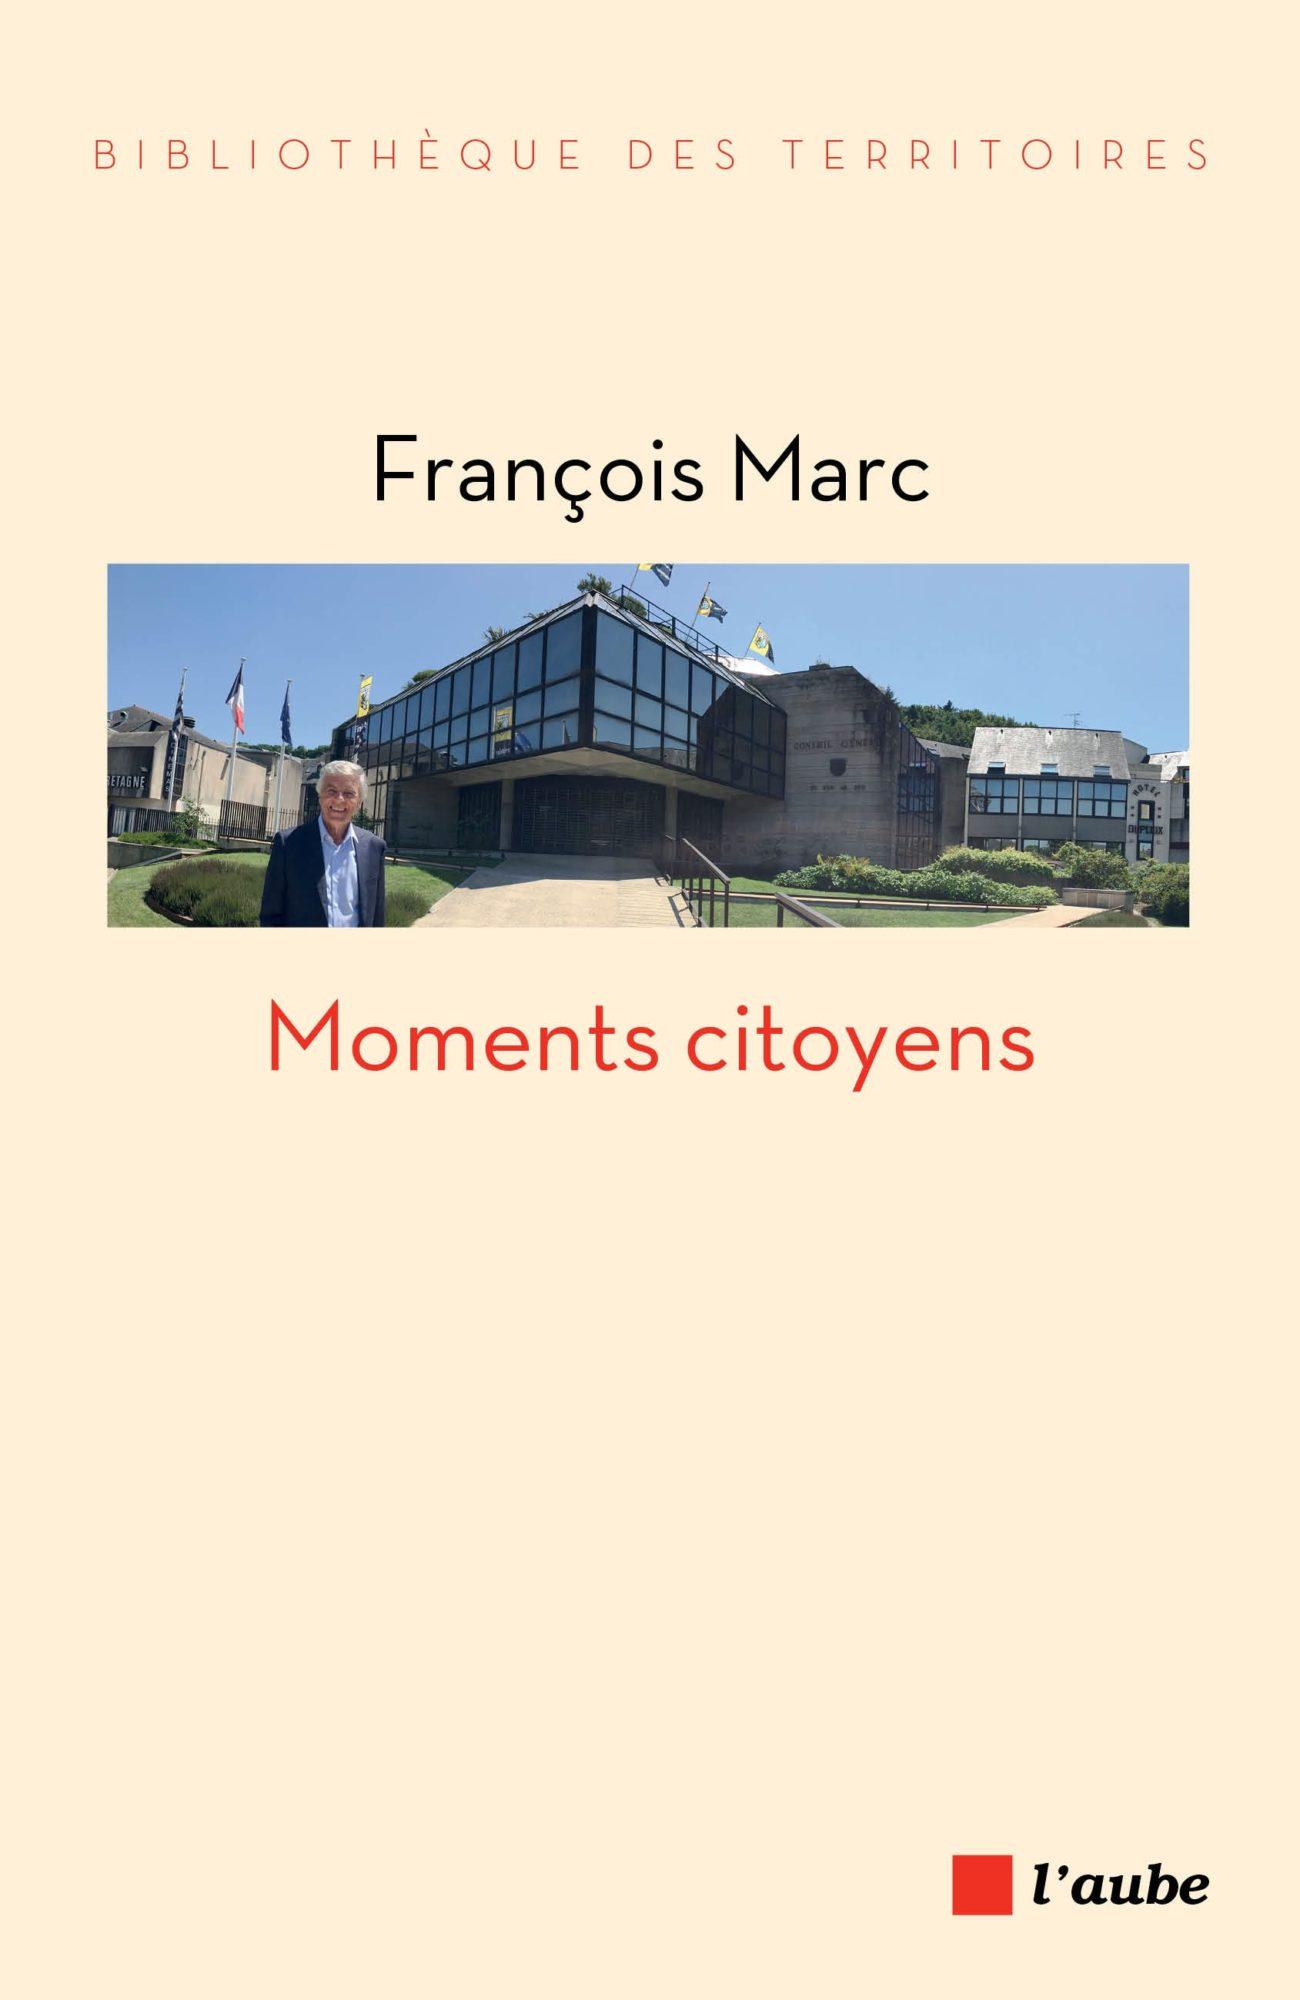 Moments citoyens